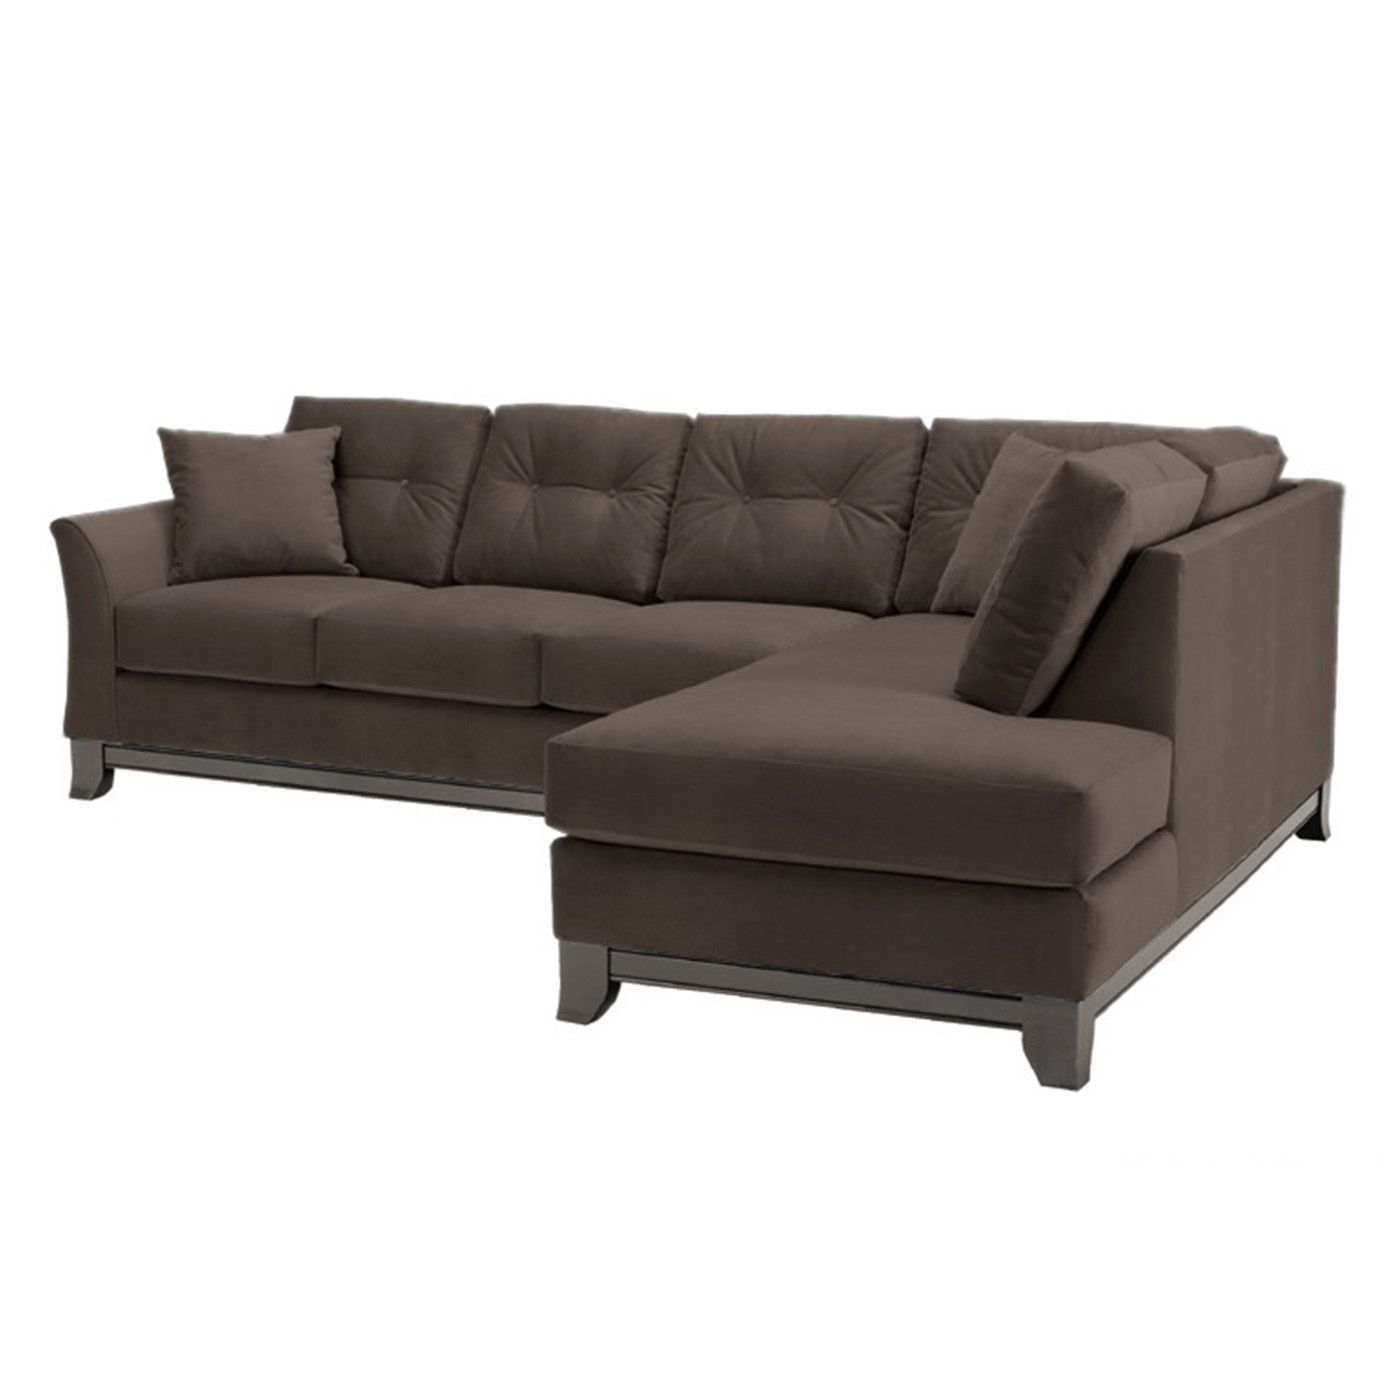 Marco 2pc Sectional Sofa CHOICE OF FABRICS